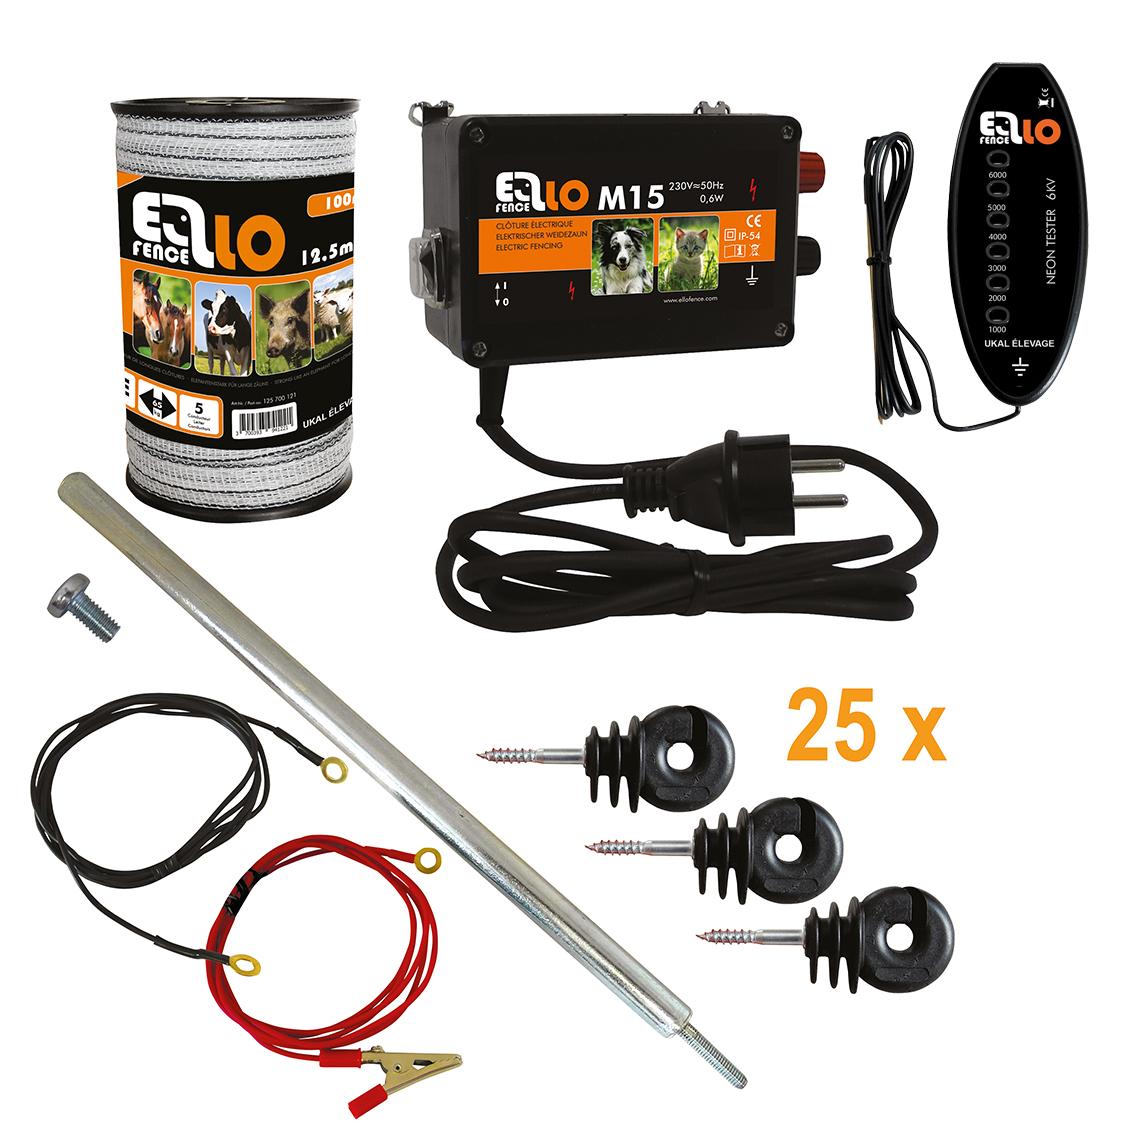 Ellofence_HobbySet_M15+Band+Isolator+Erdpfahl+Tester_550008_NeueErdung